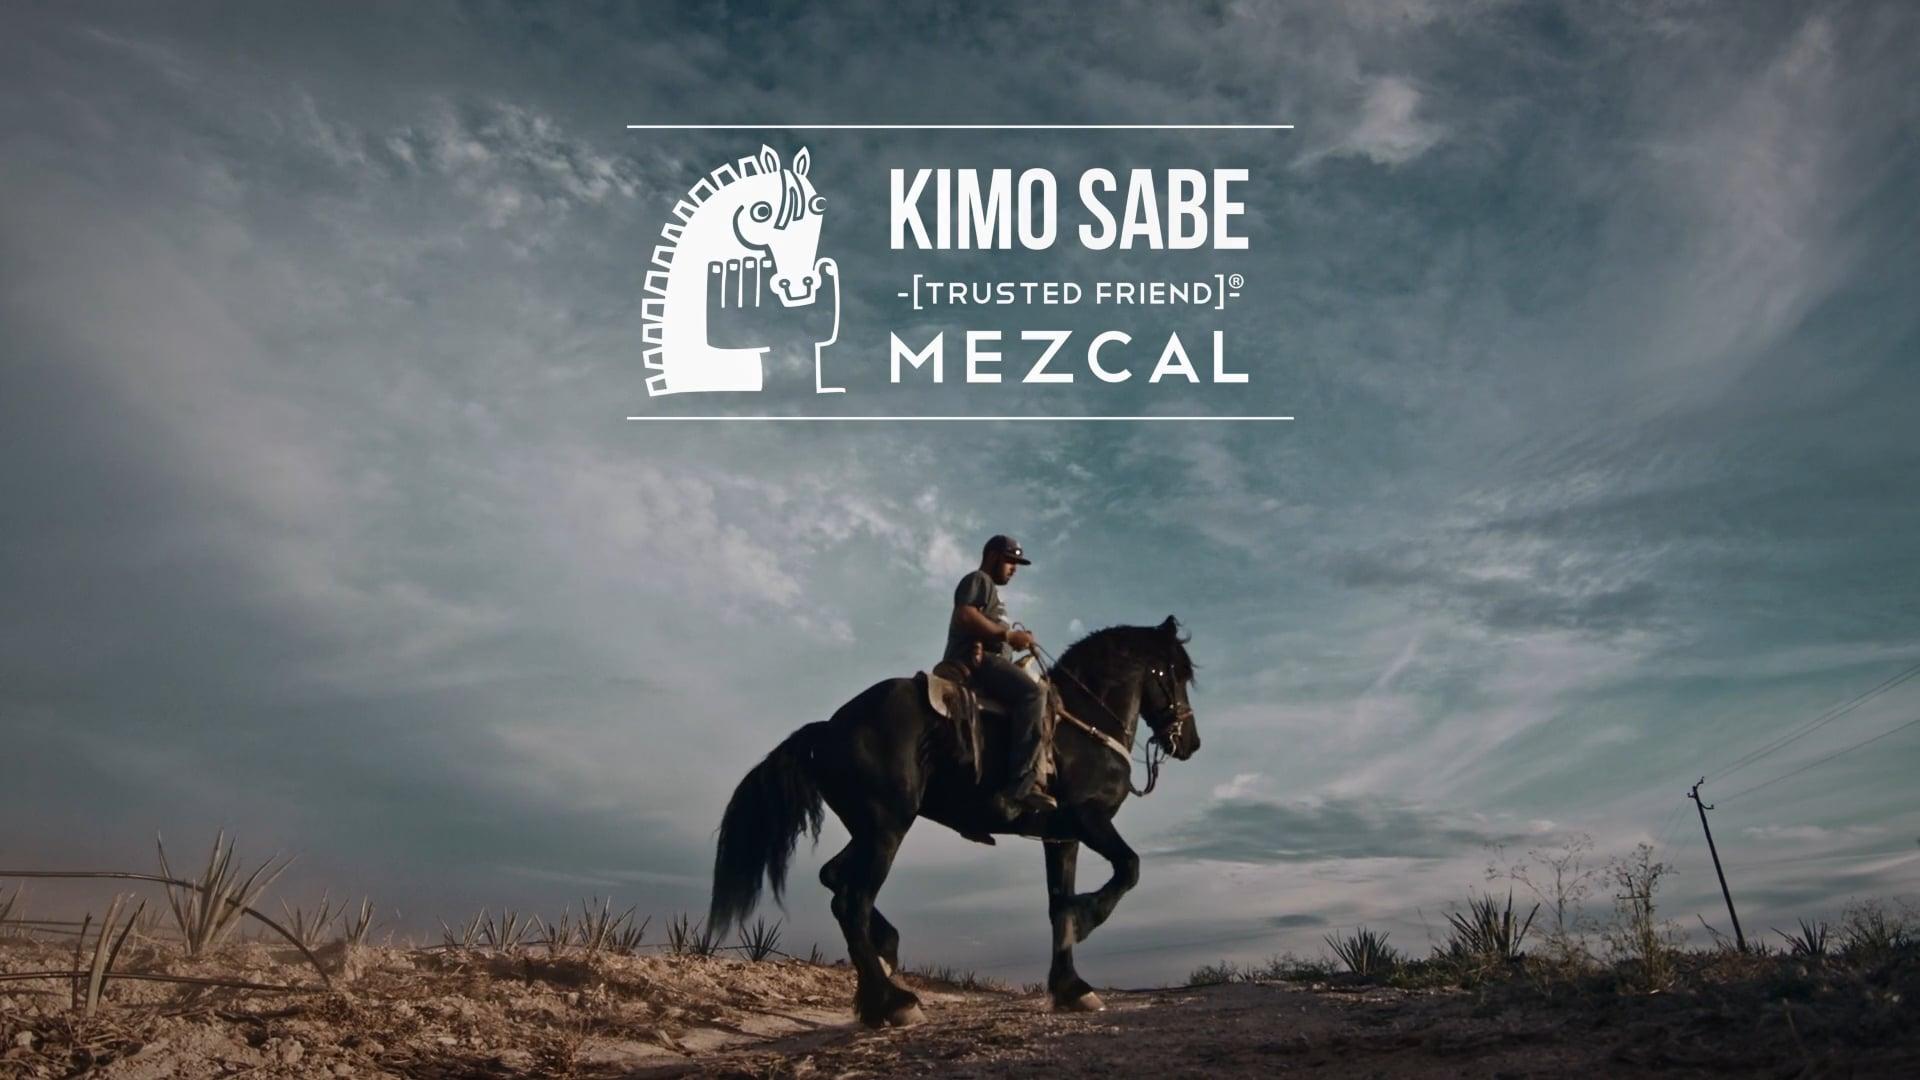 KIMO SABE